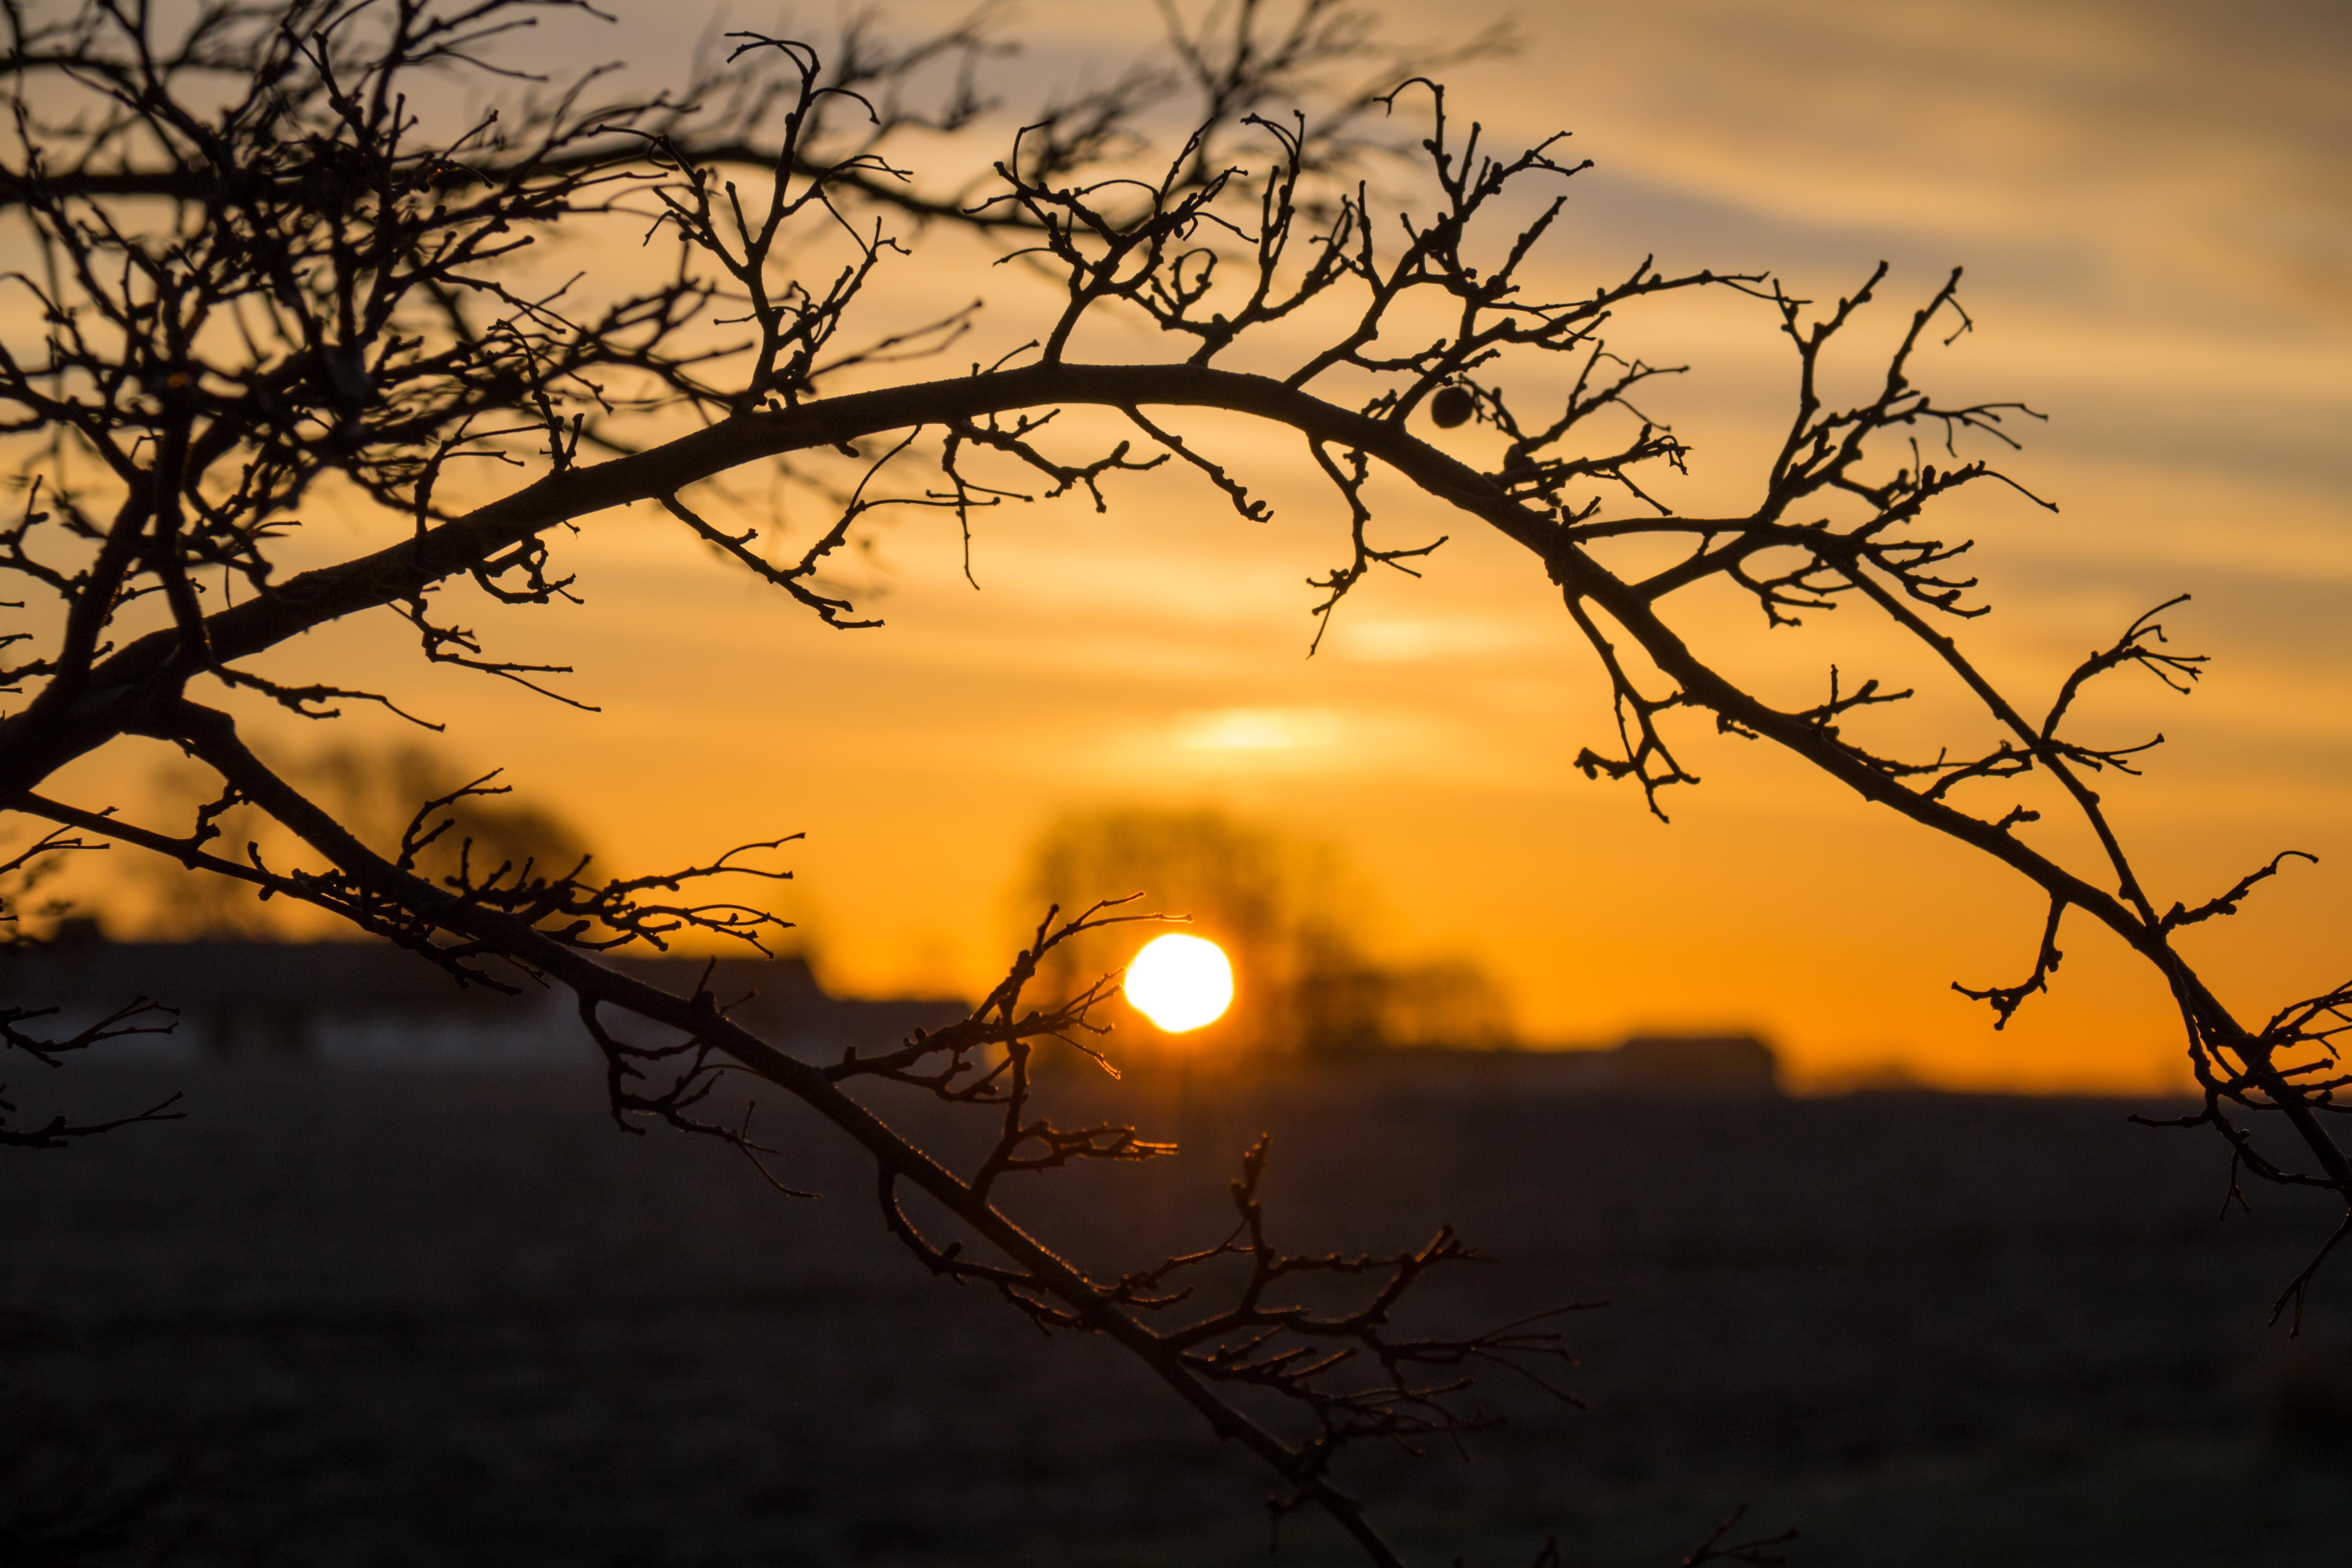 Wallpaper Sunlight Landscape Sunset Nature Reflection Sky